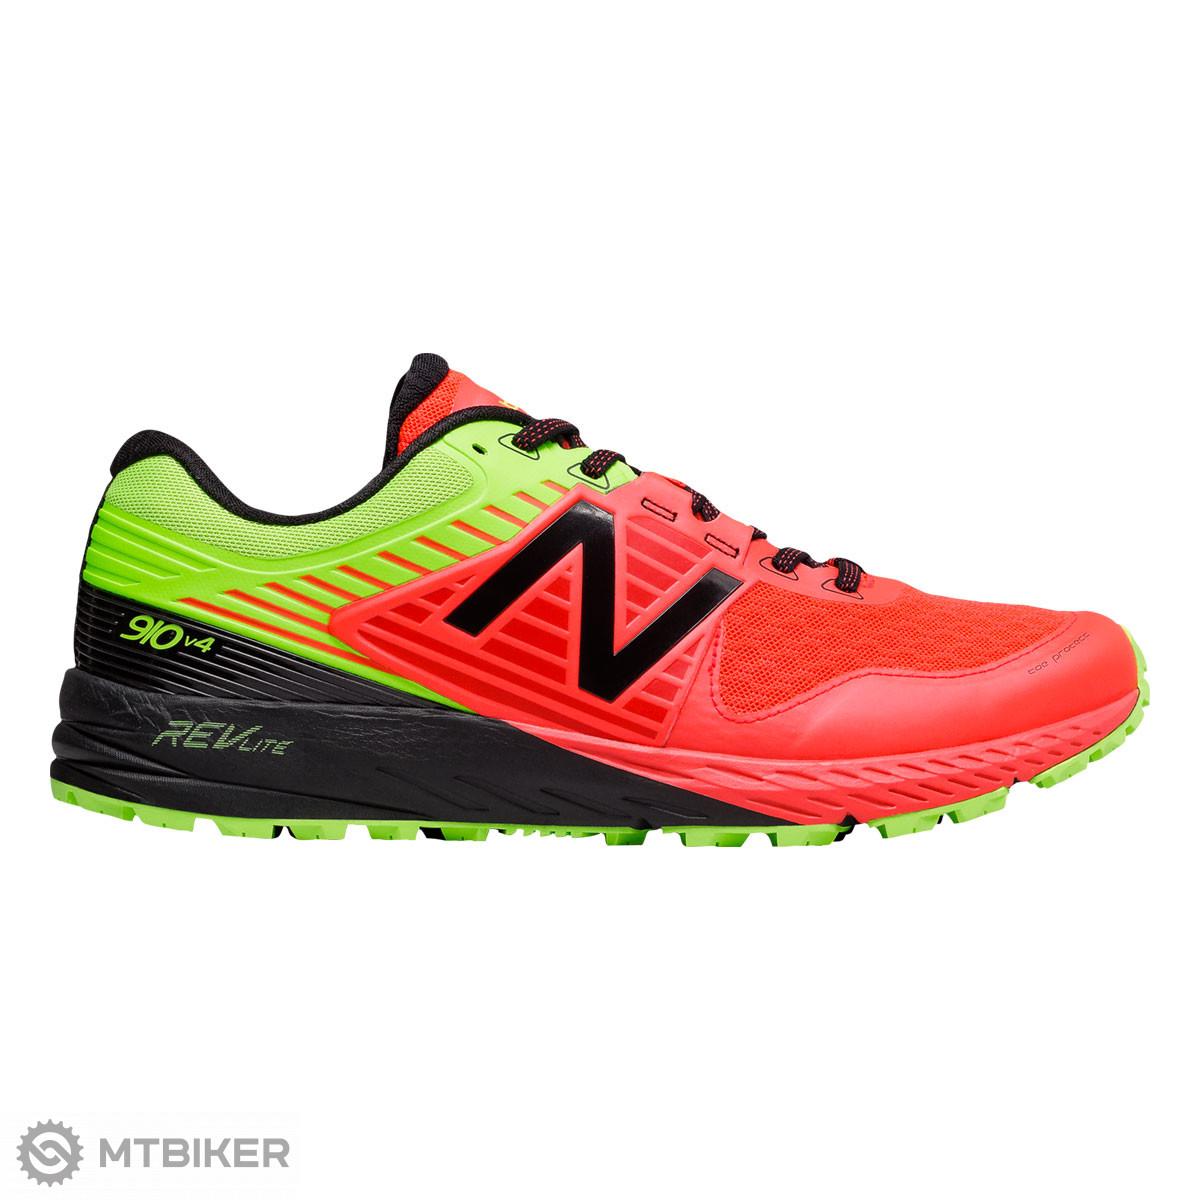 New Balance MT910RG4 pánske trailove topánky oranžové - MTBIKER Shop 9546504c0bb